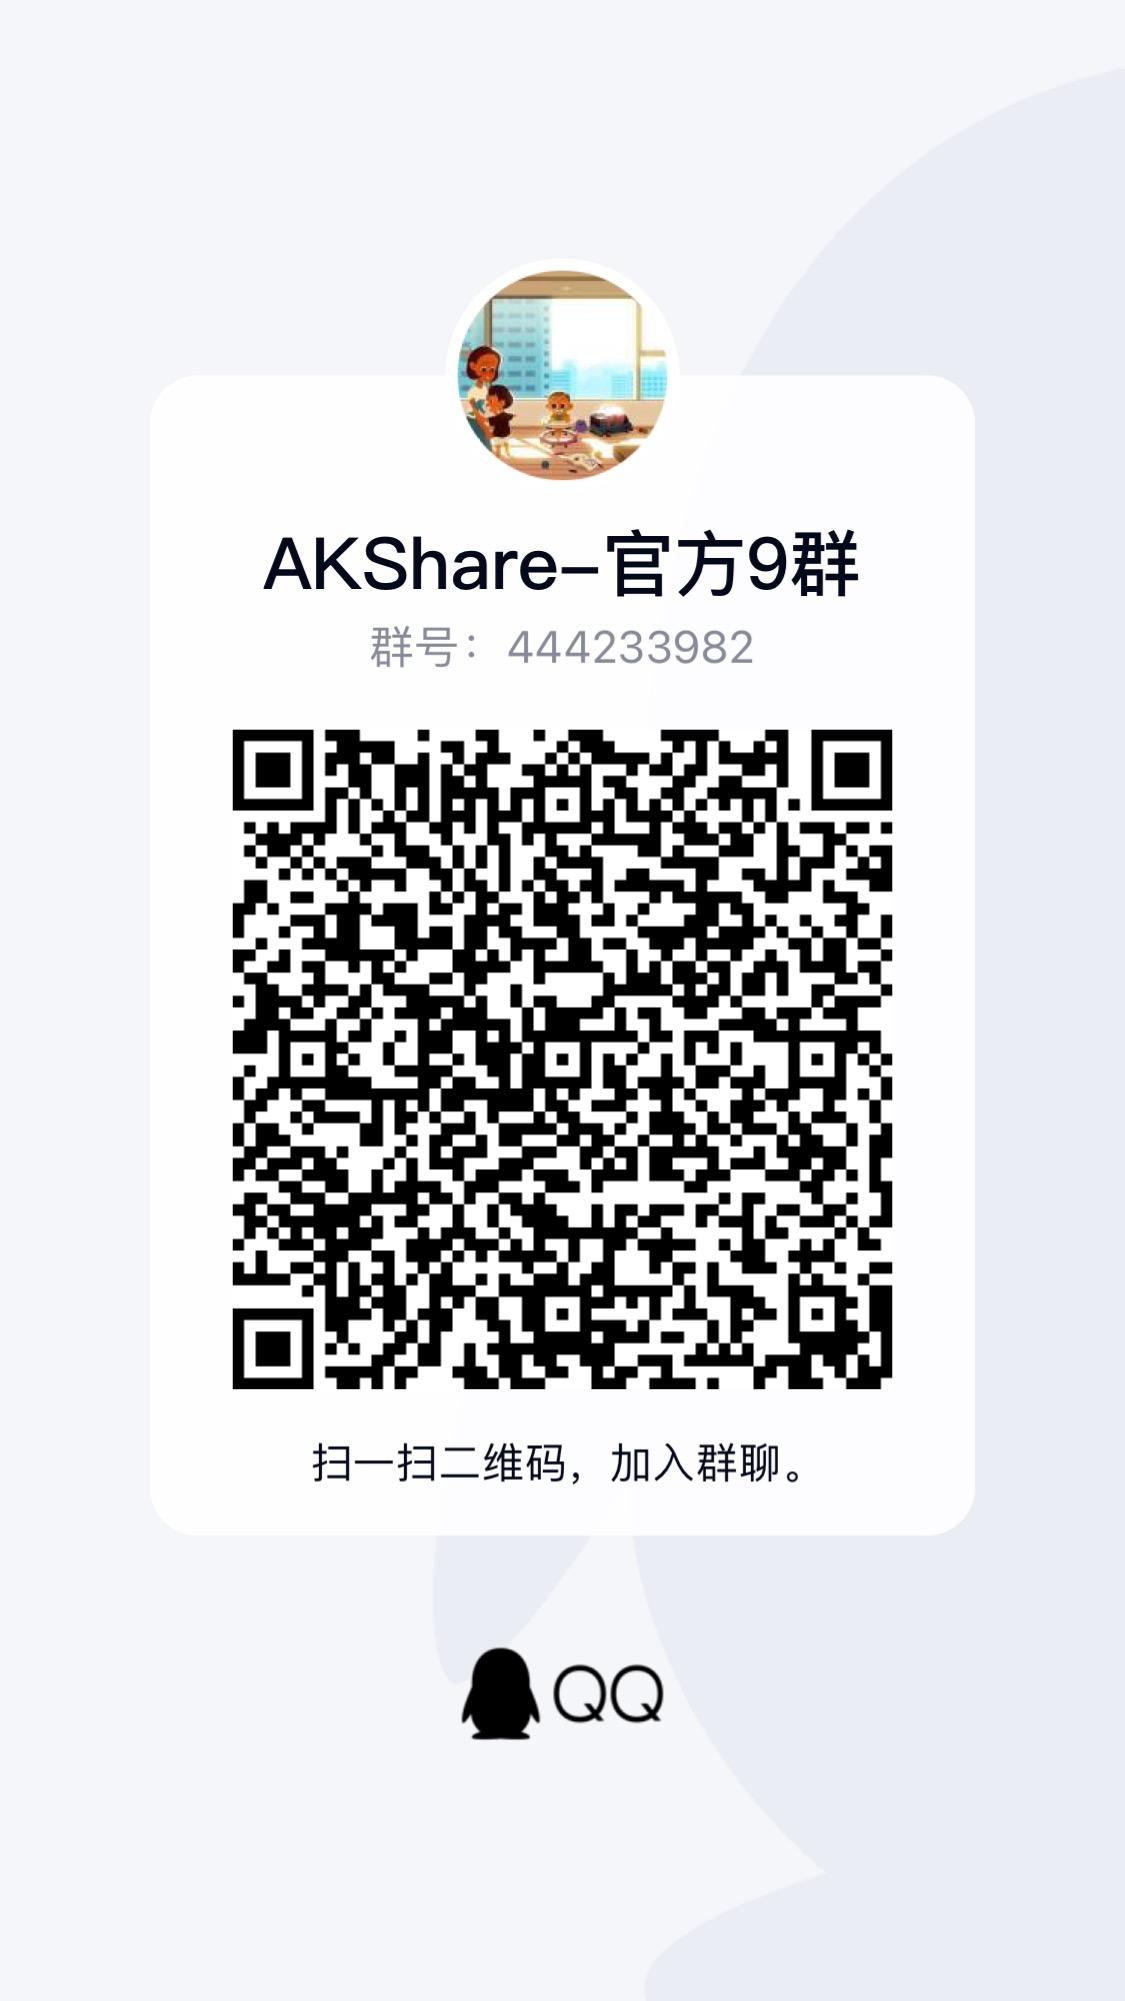 AKShare-官方